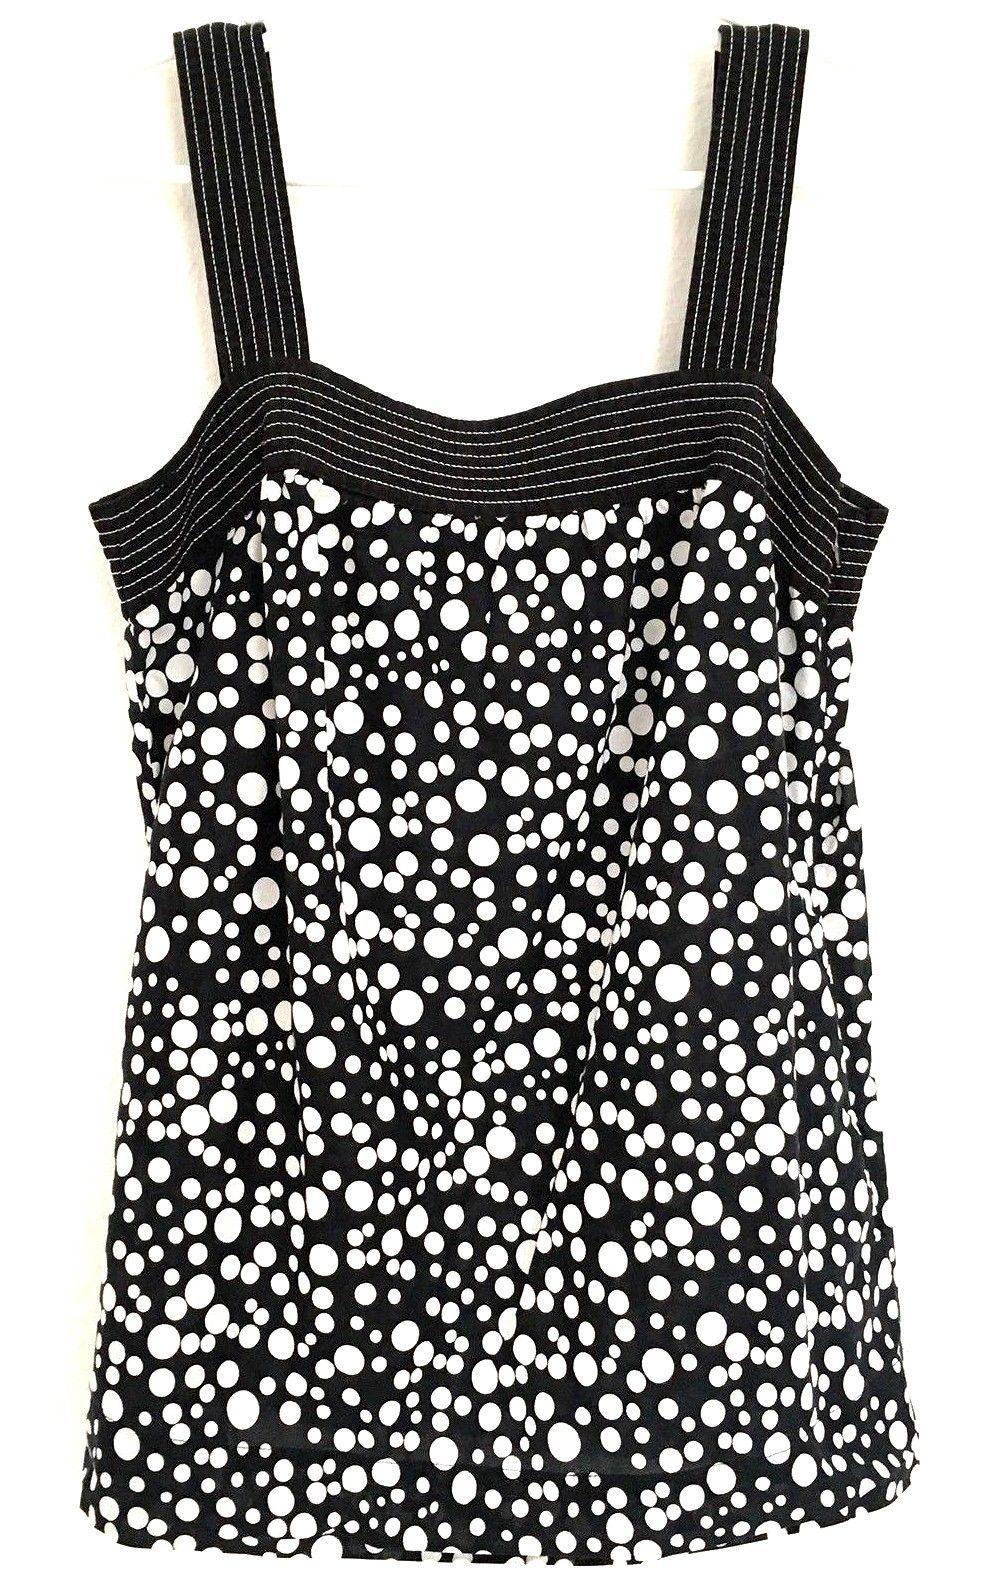 7d171aa08de 57. 57. Previous. Ann Taylor Loft Womens 4 Shirt Sleeveless Black White  Career Square Neck Tunic